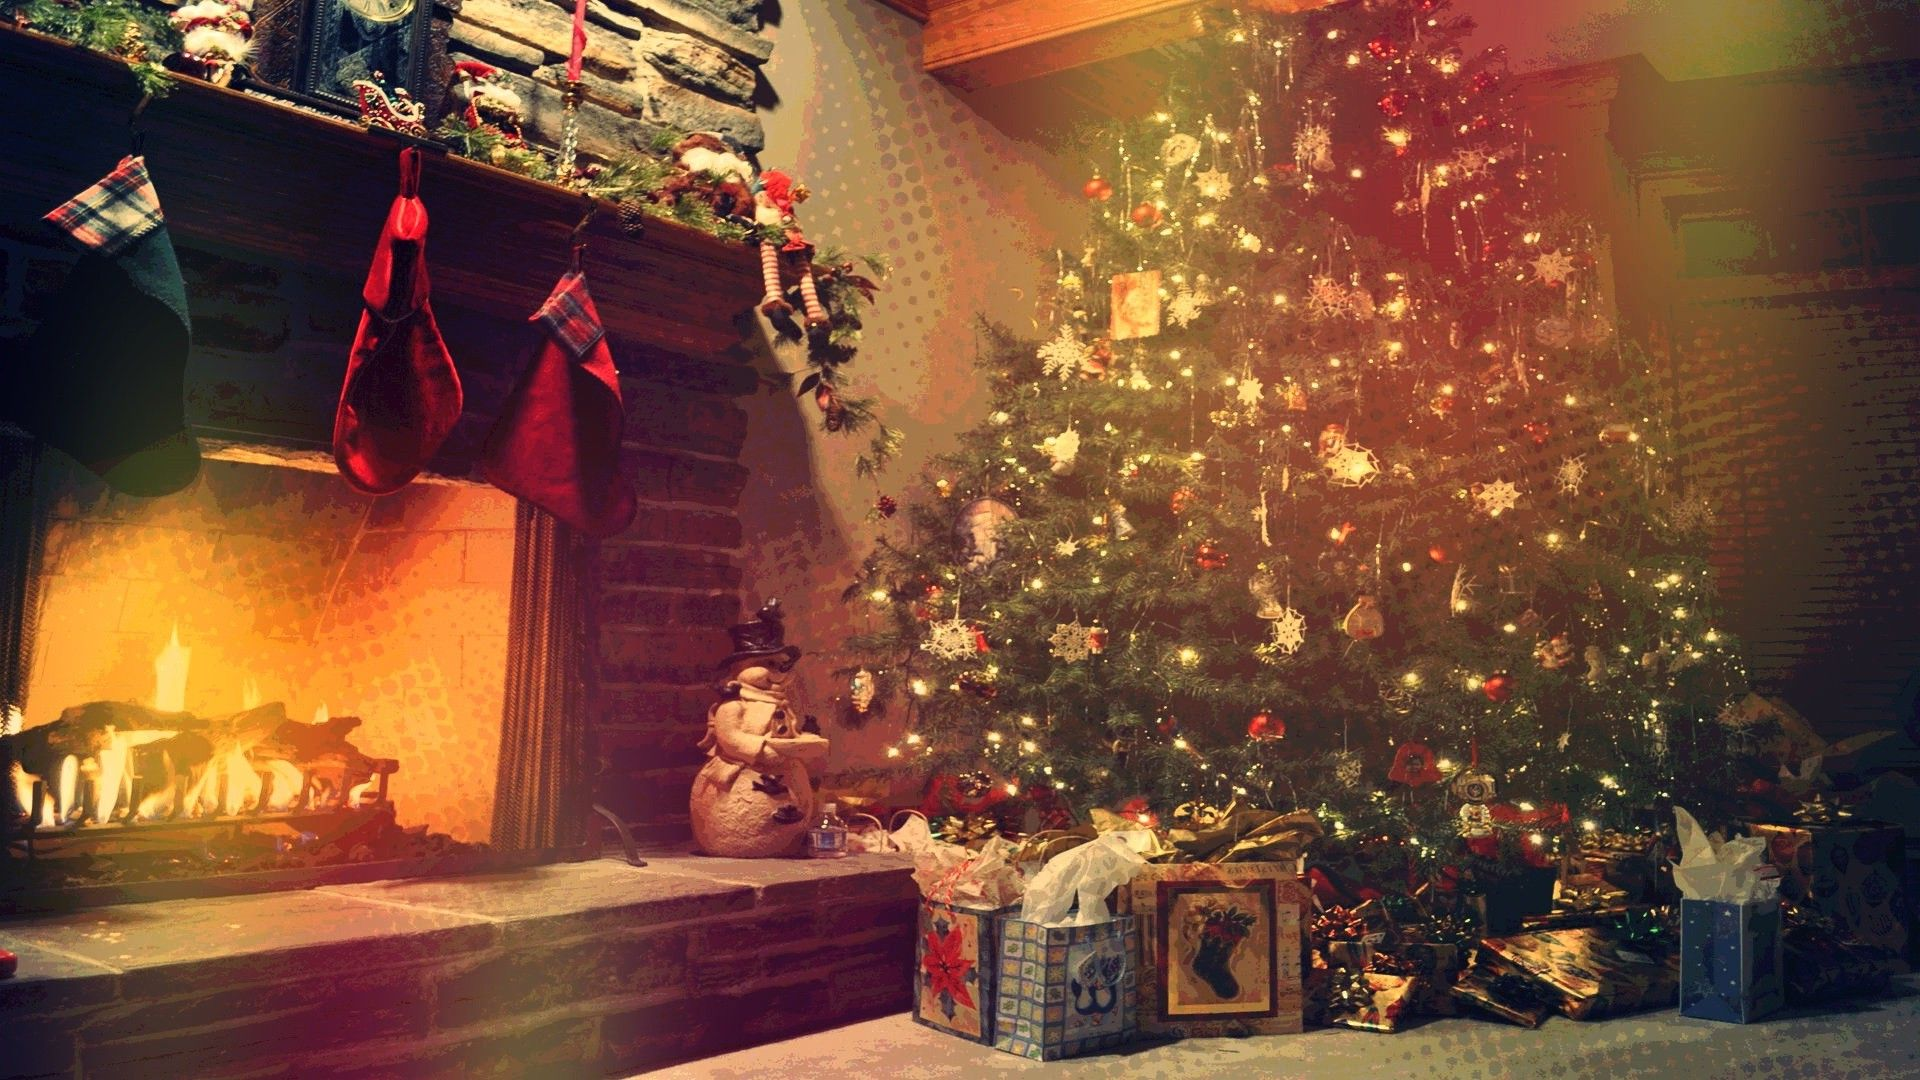 Christmas Fireplace Comfort Desktop Wallpaper